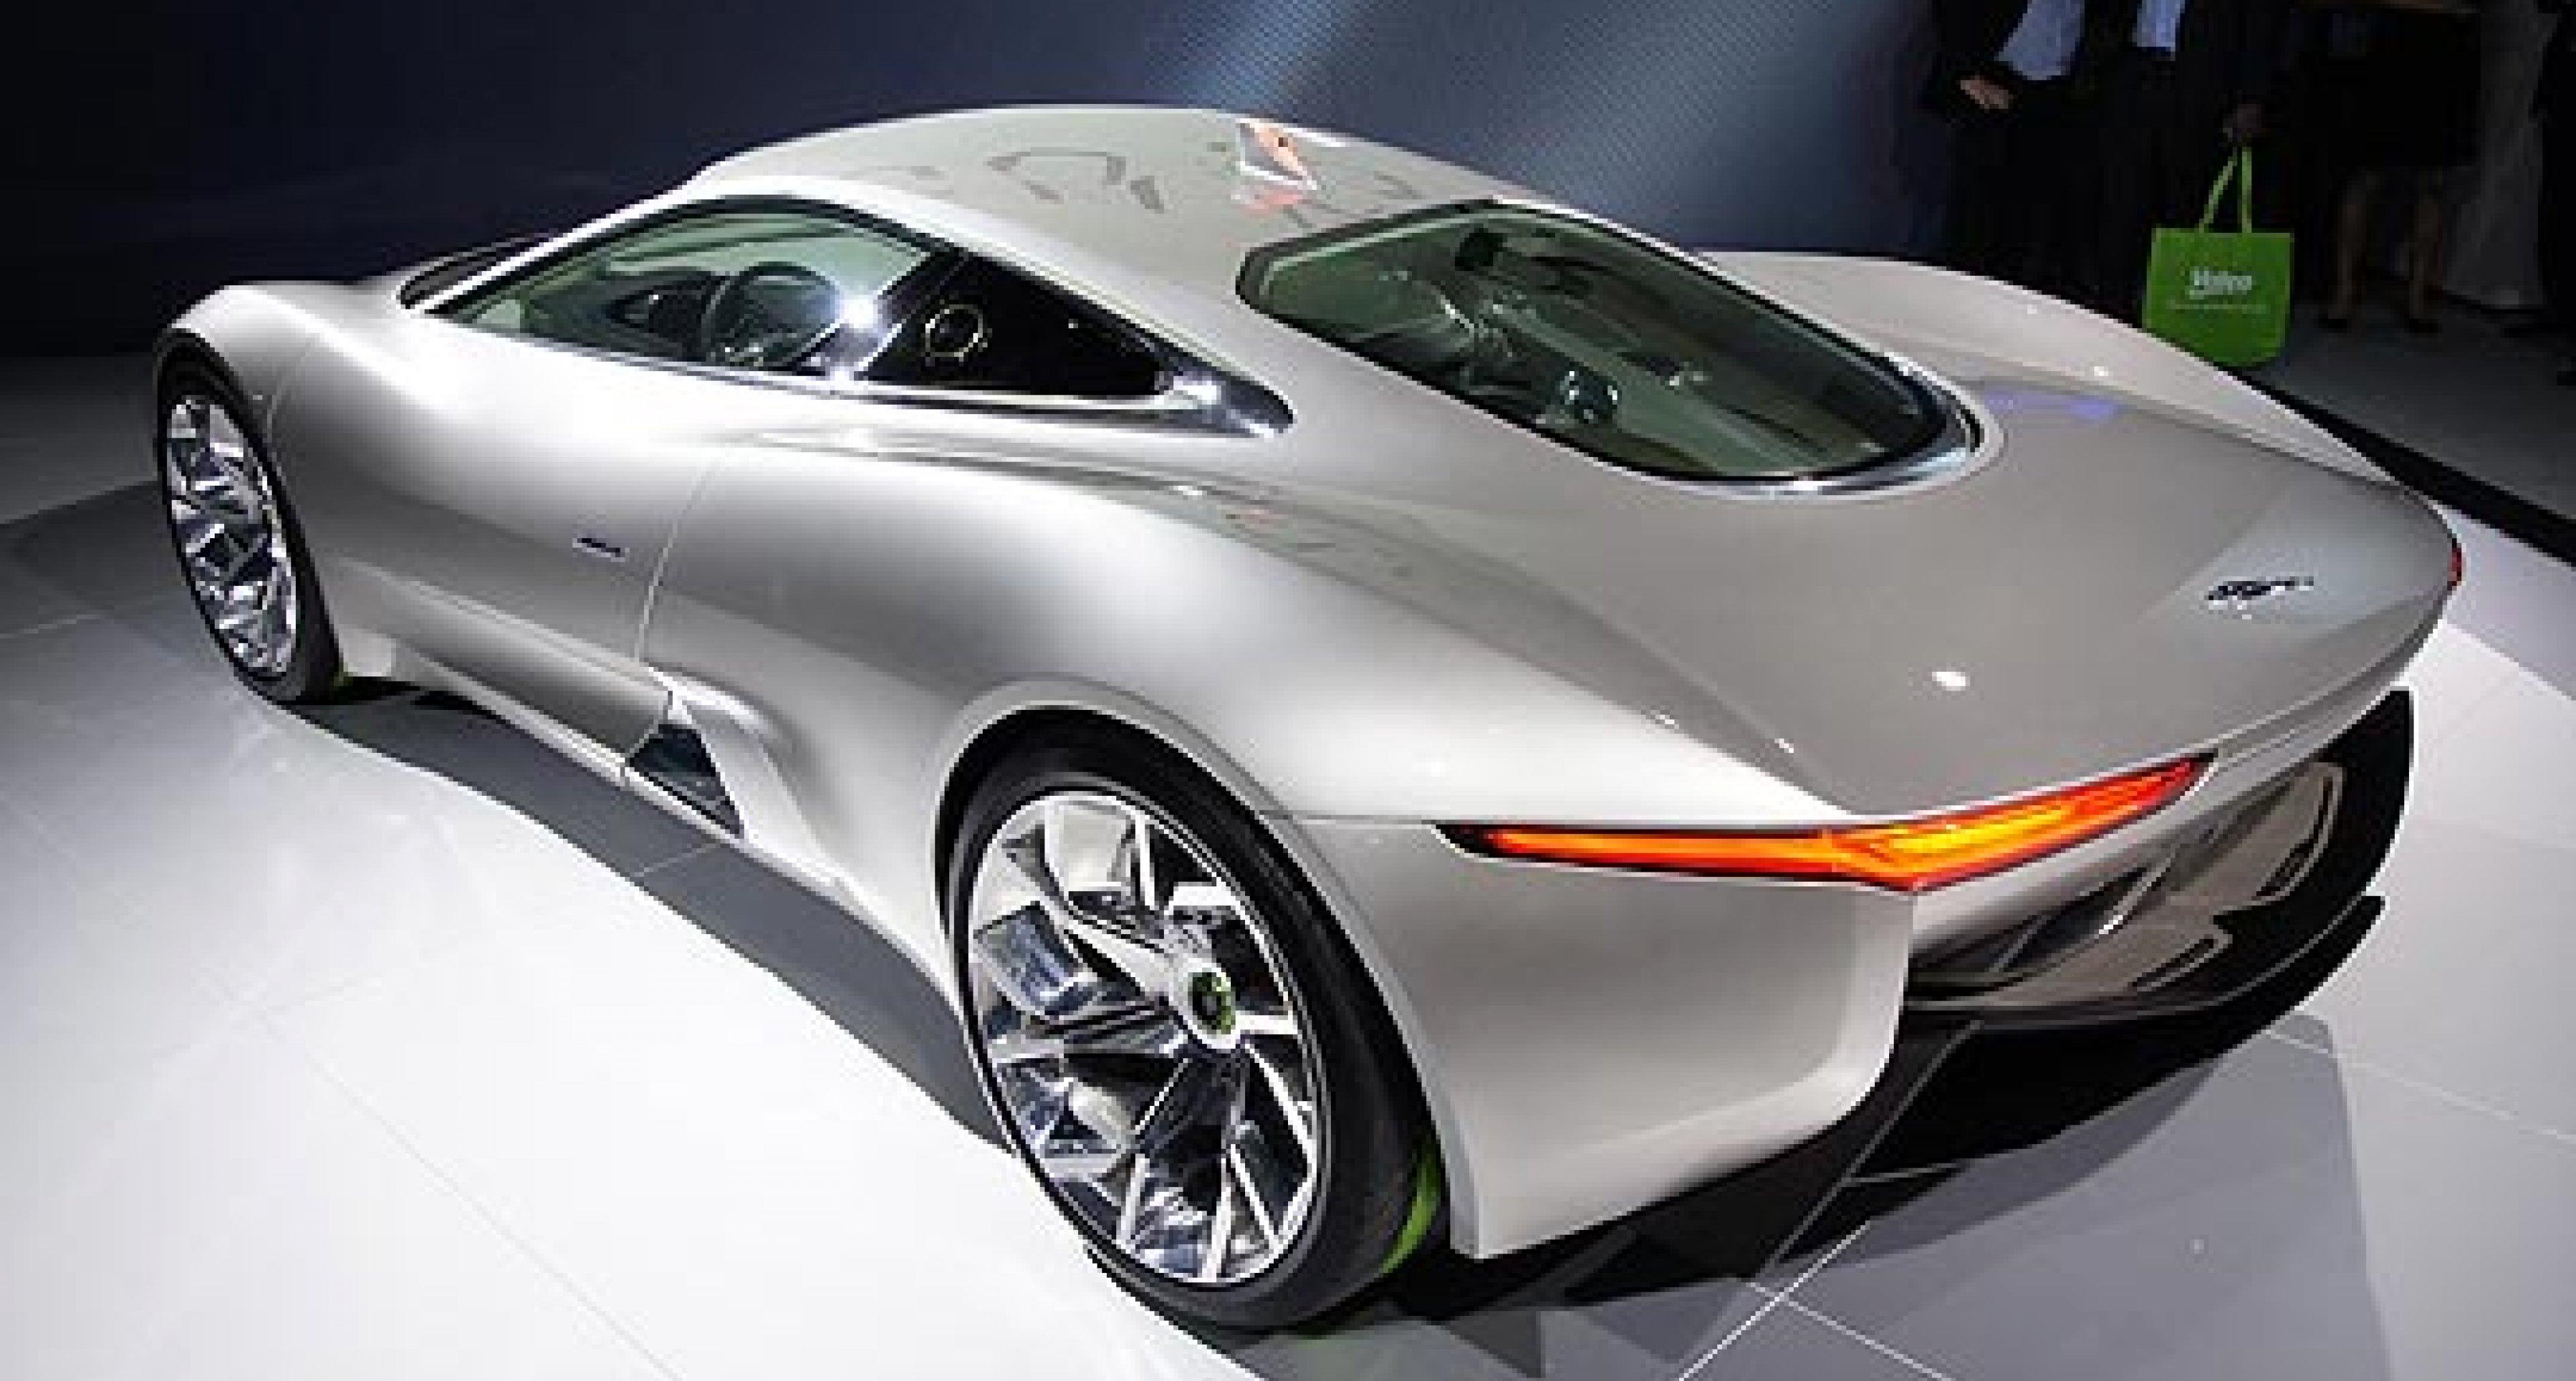 Paris Motor Show: Review by John Simister